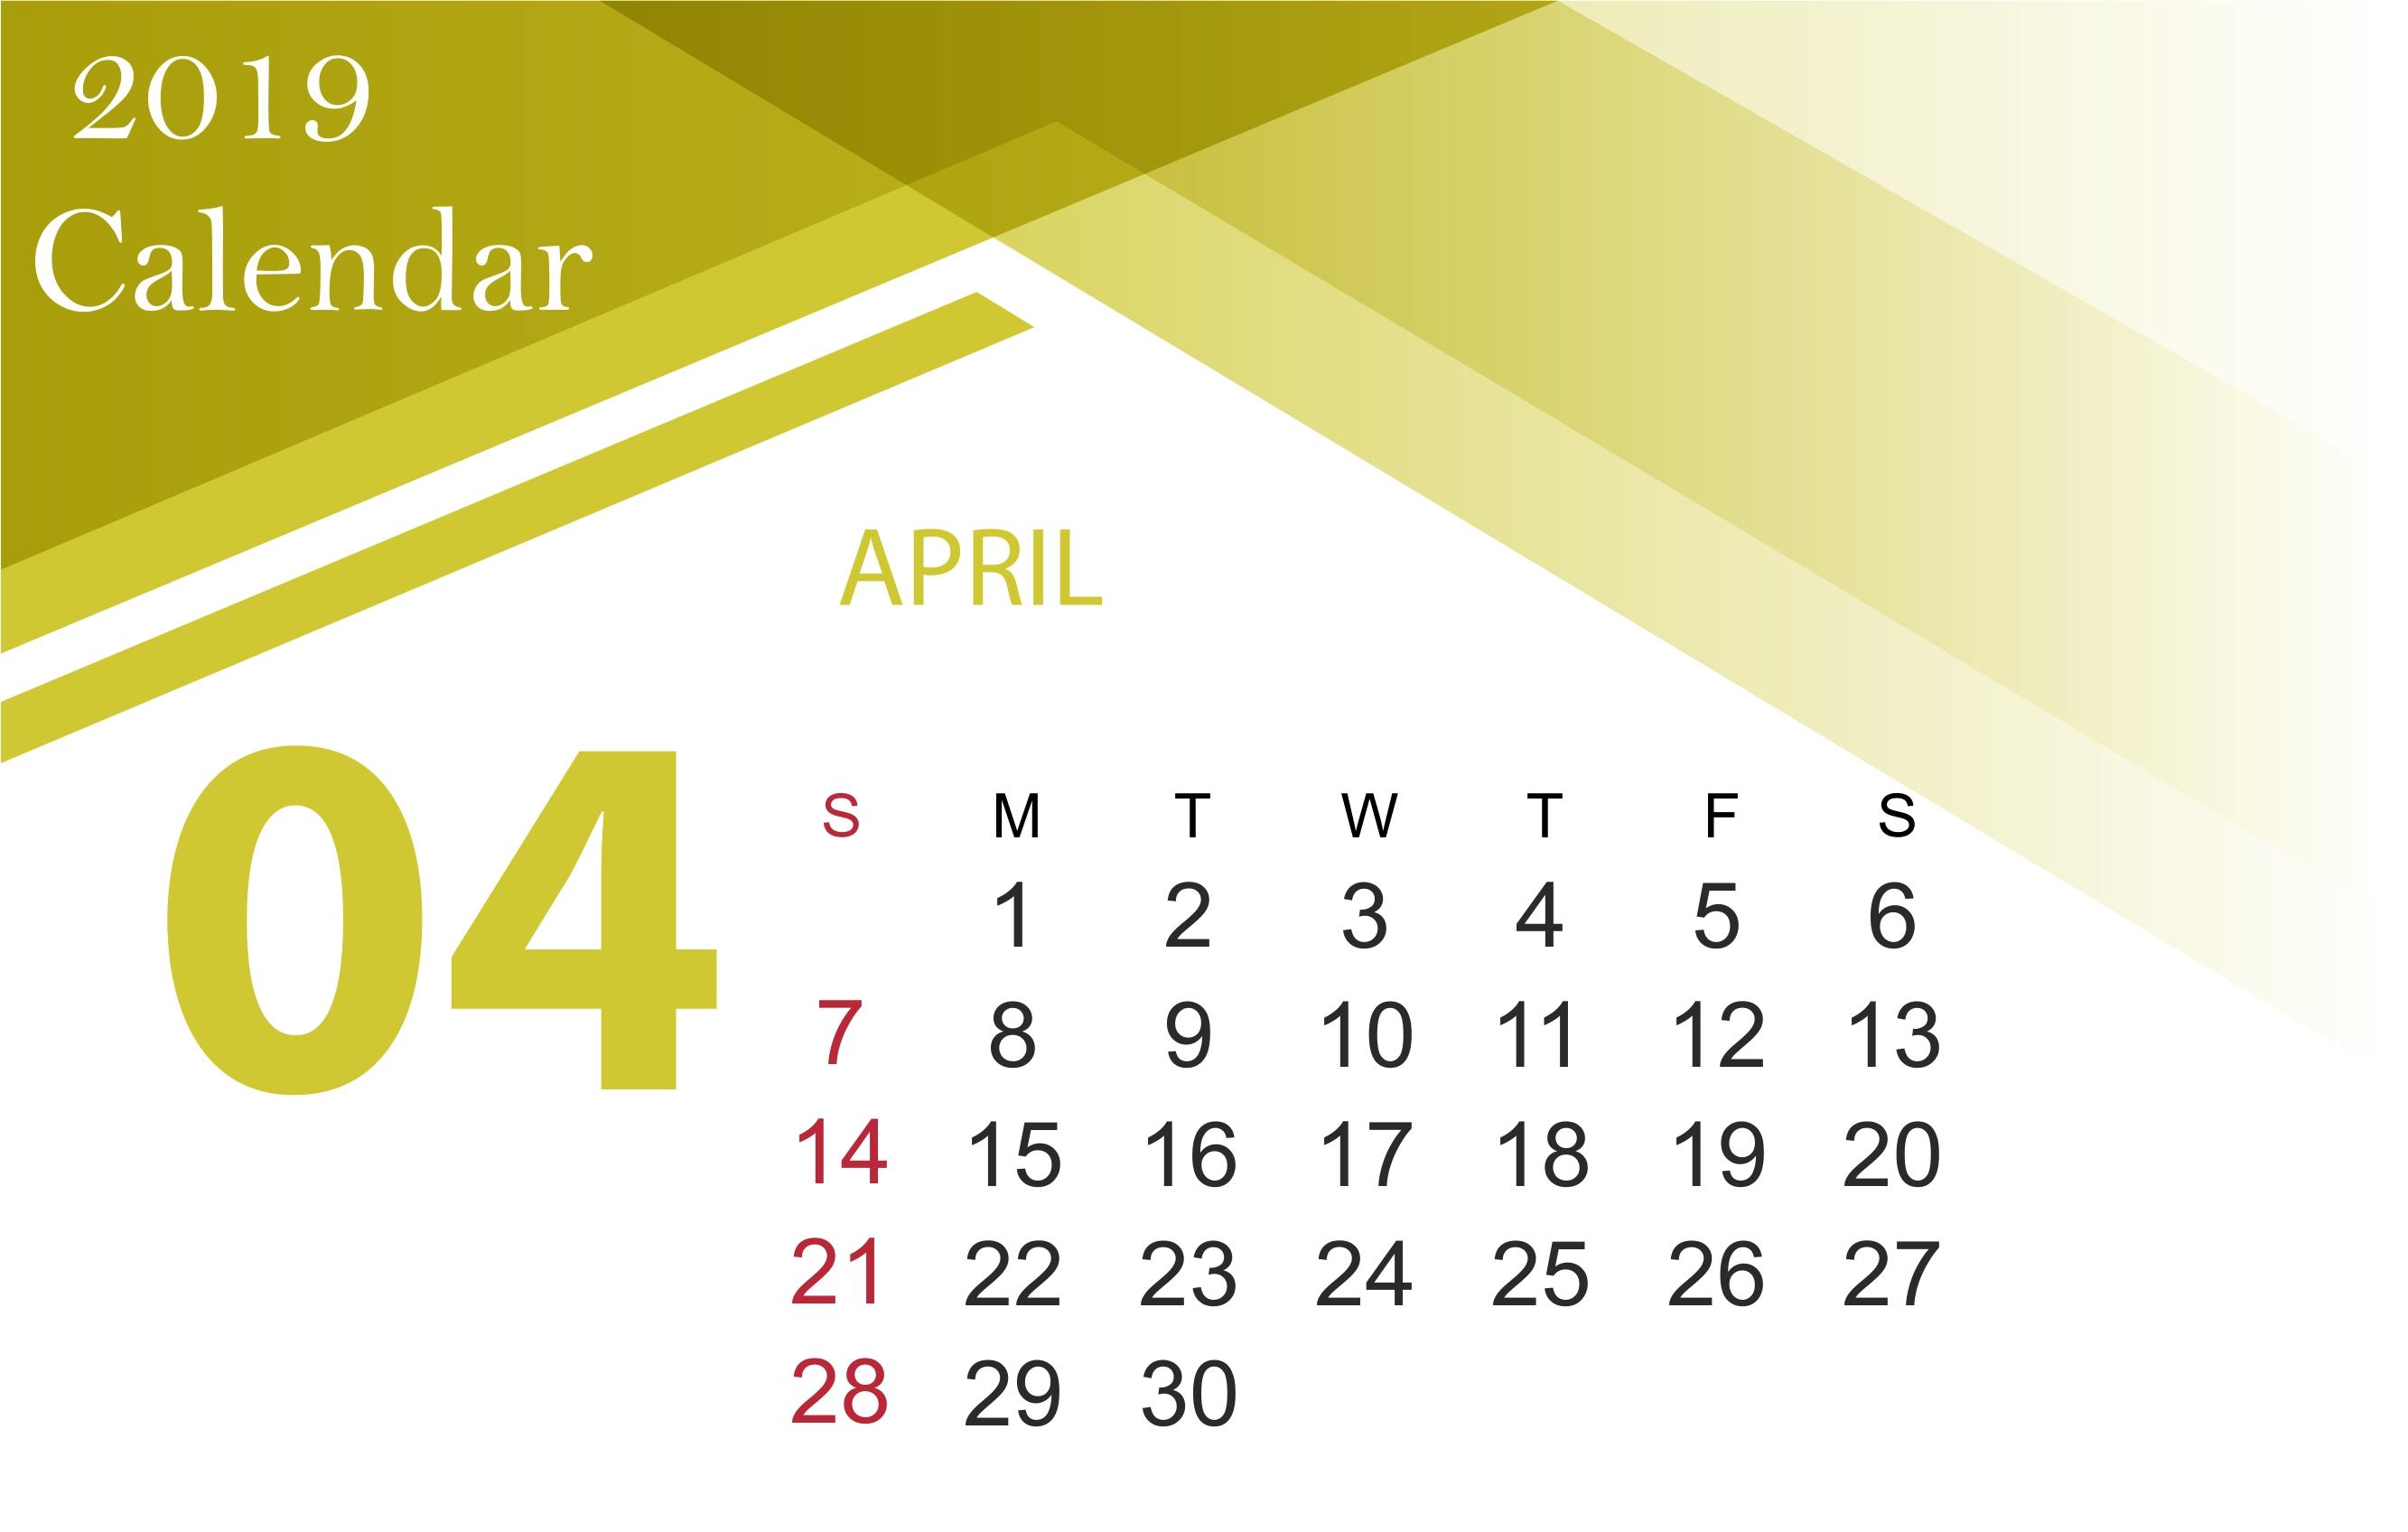 April 2019 Calendar Printable [Free]   Site Provides Calendar Calendar April 6 2019